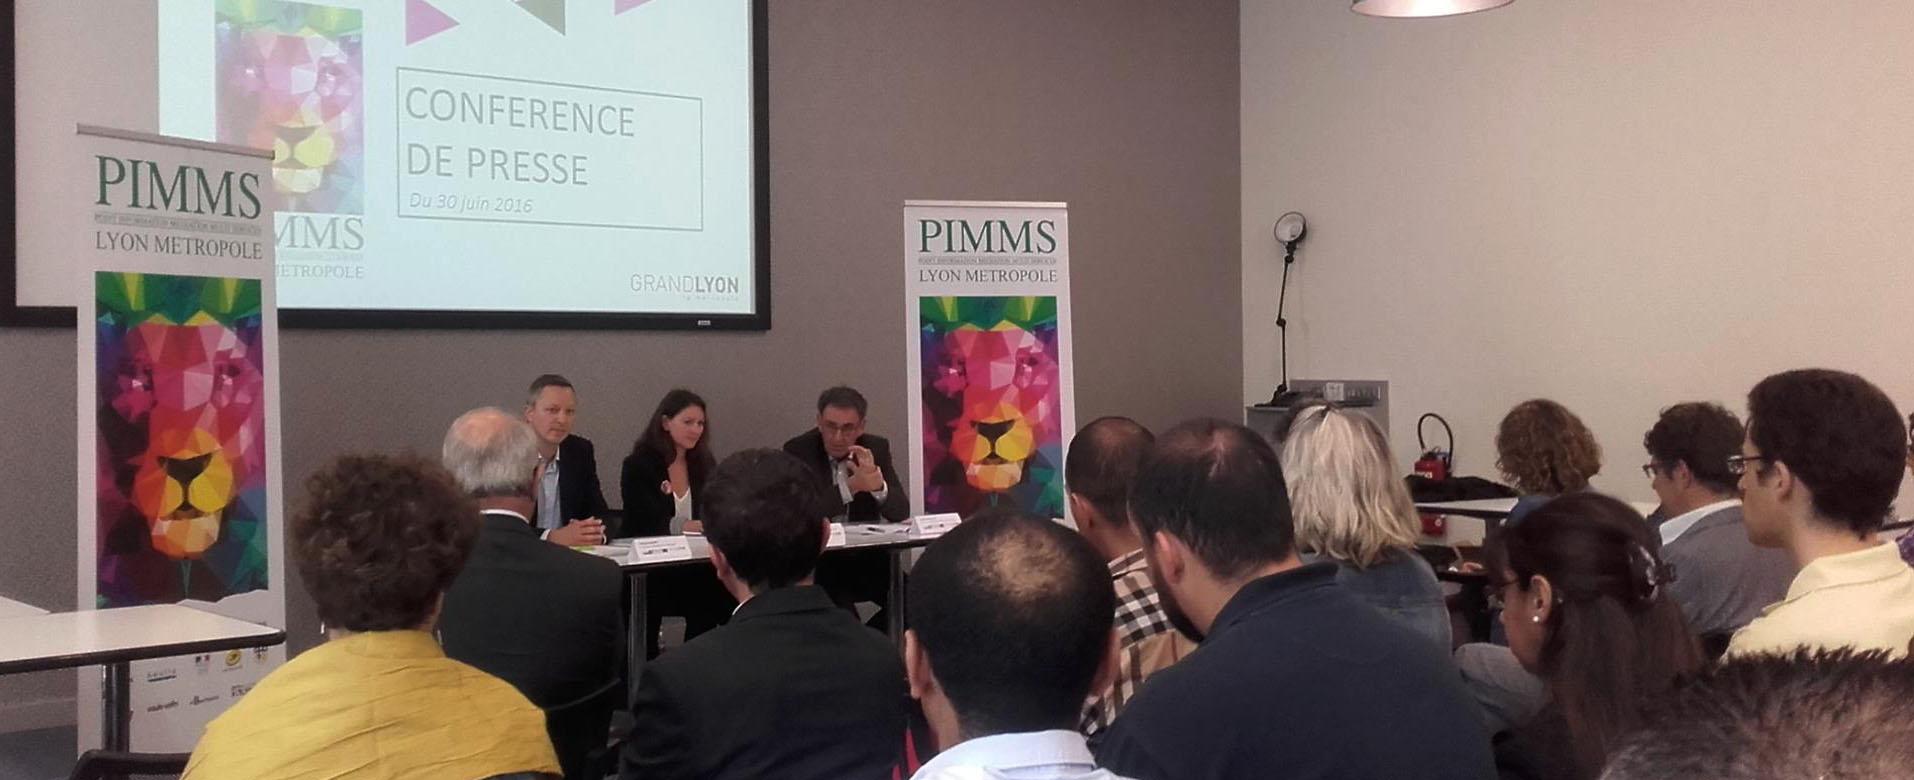 PIMMS_conference_presse